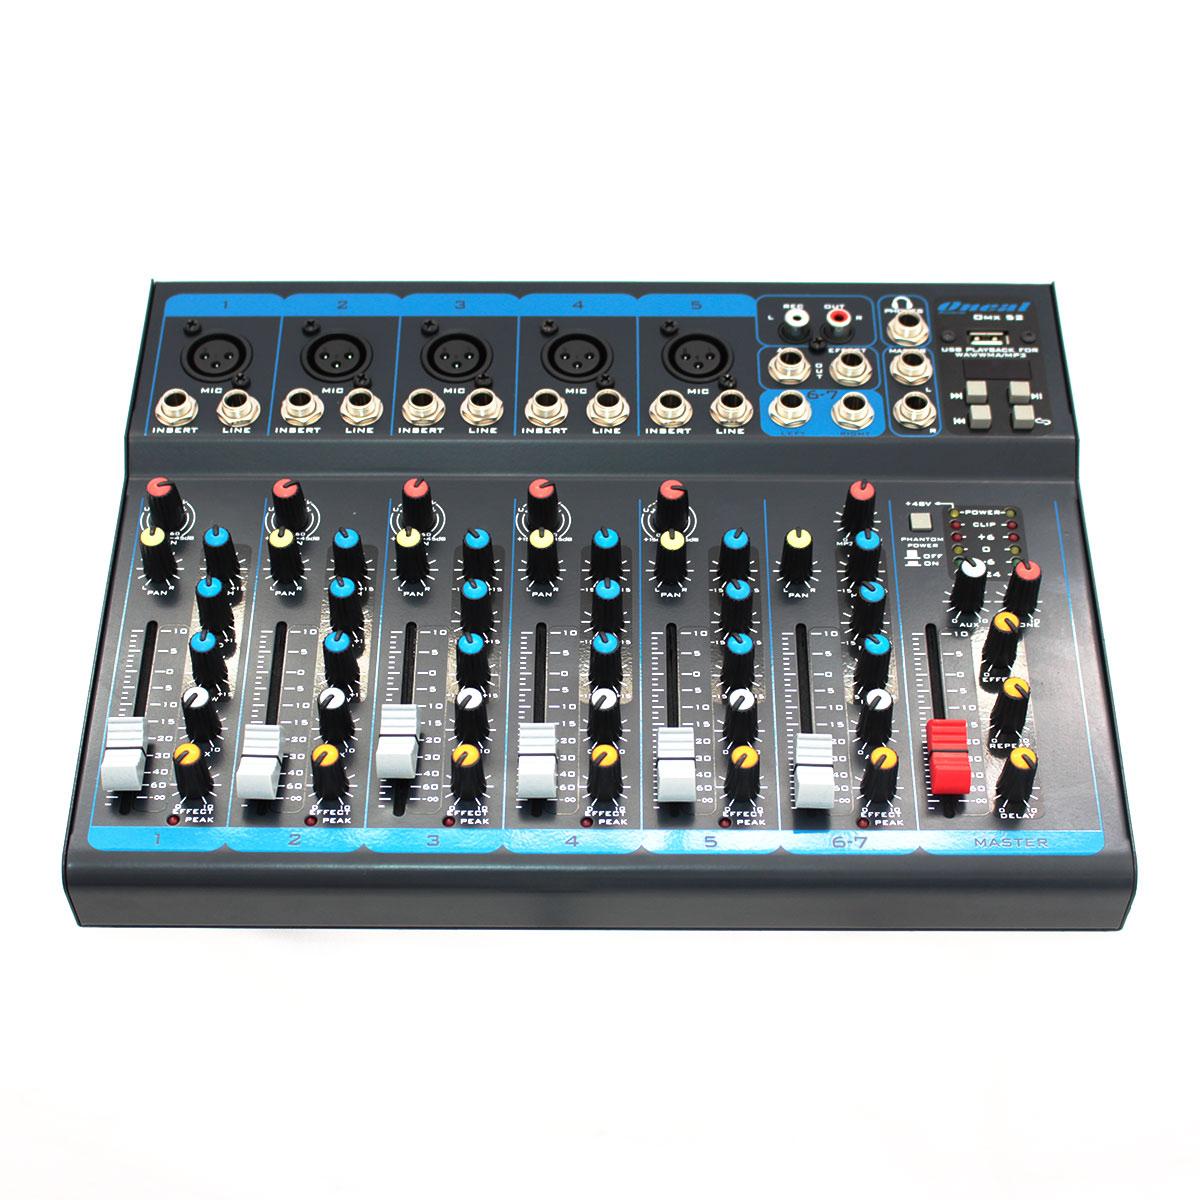 OMX52 - Mesa de Som / Mixer 5 Canais c/ USB OMX 52 - Oneal